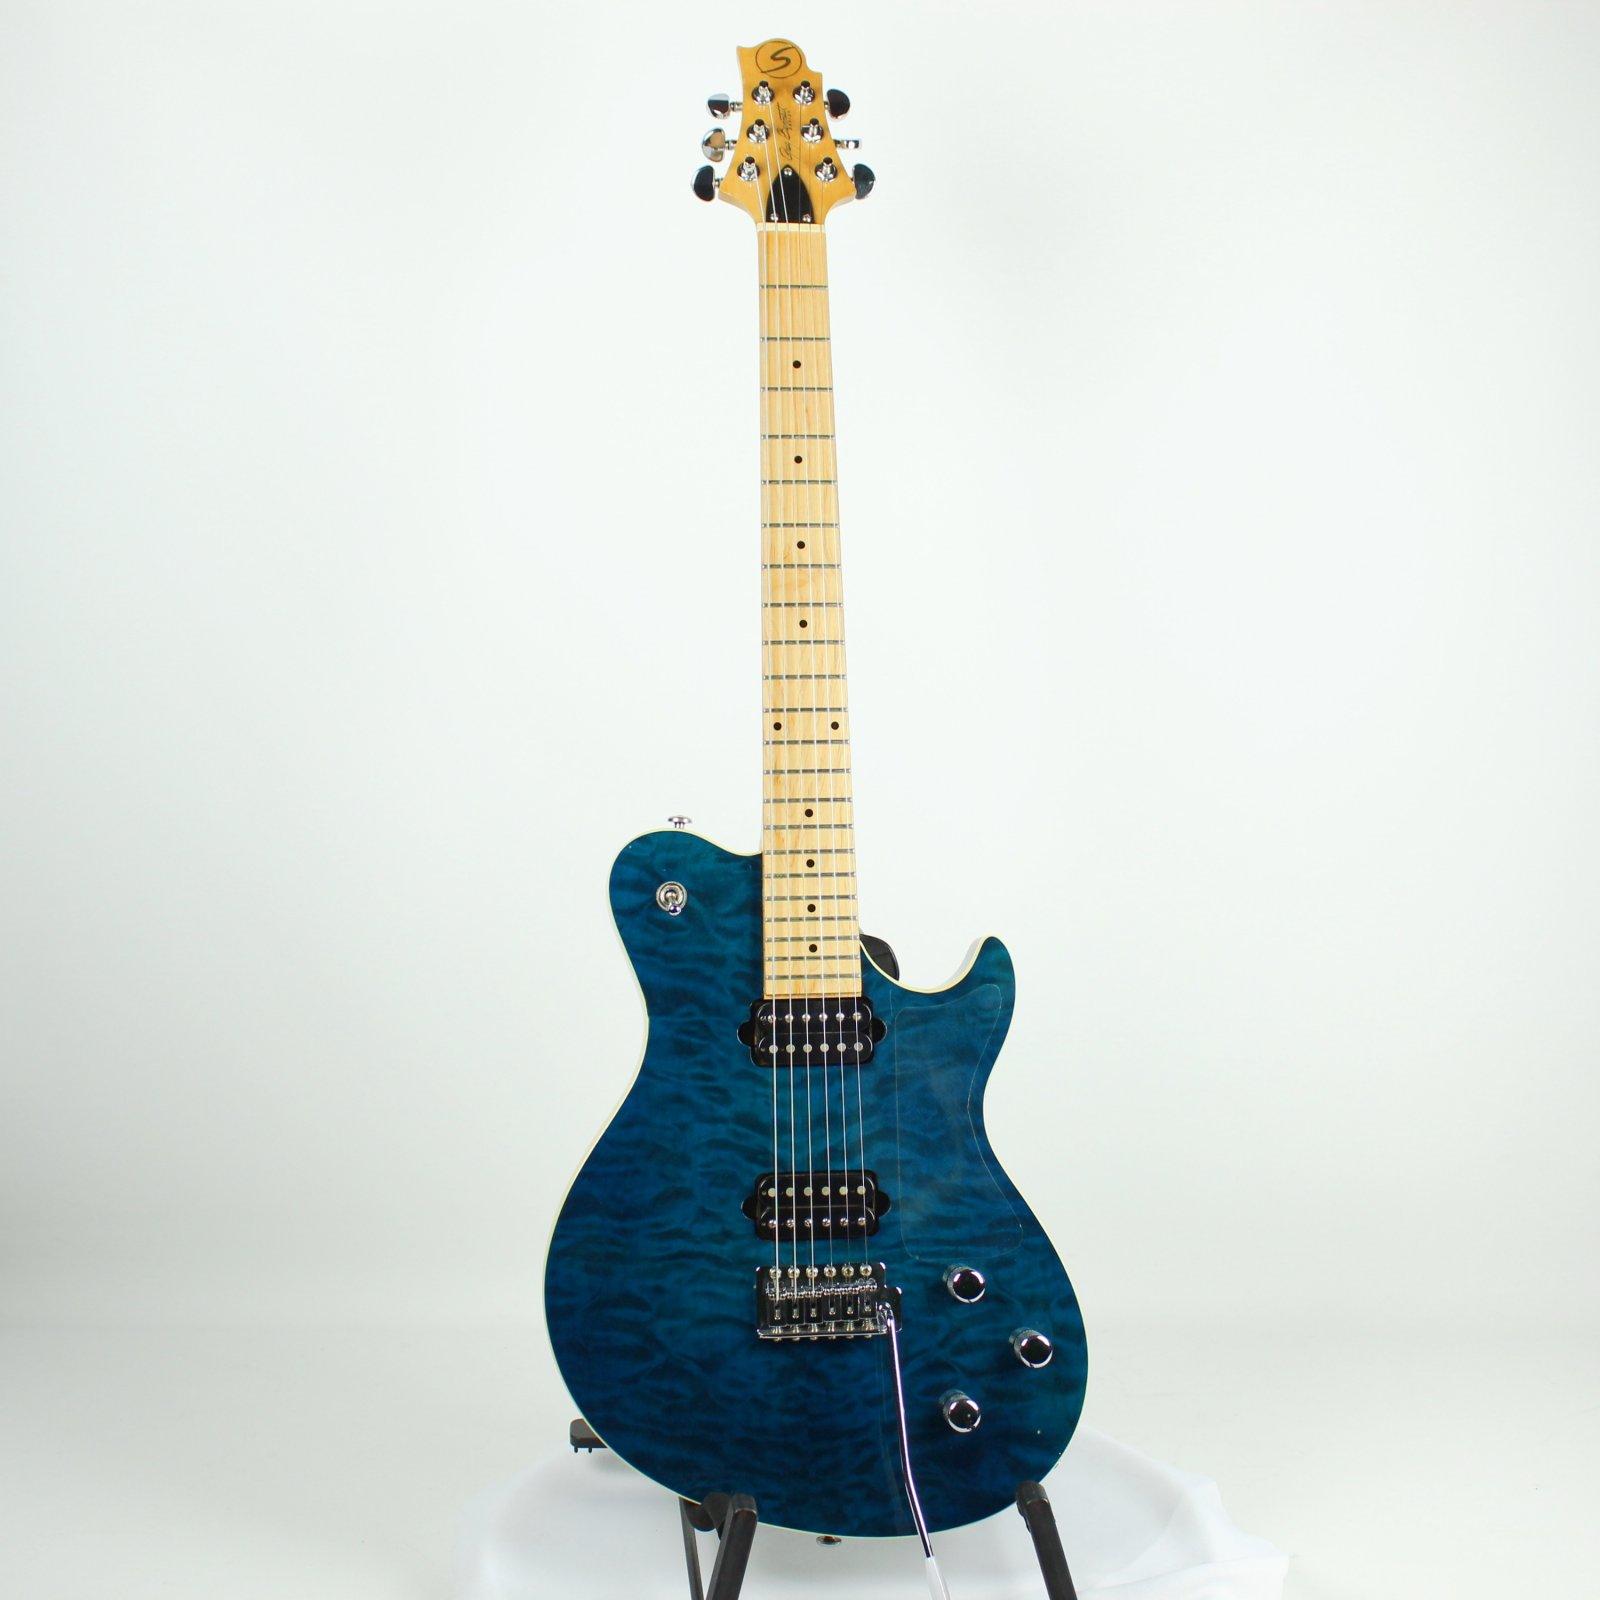 Greg Bennett FB1 Fastback Electric Guitar, Transparent Blue (USED)